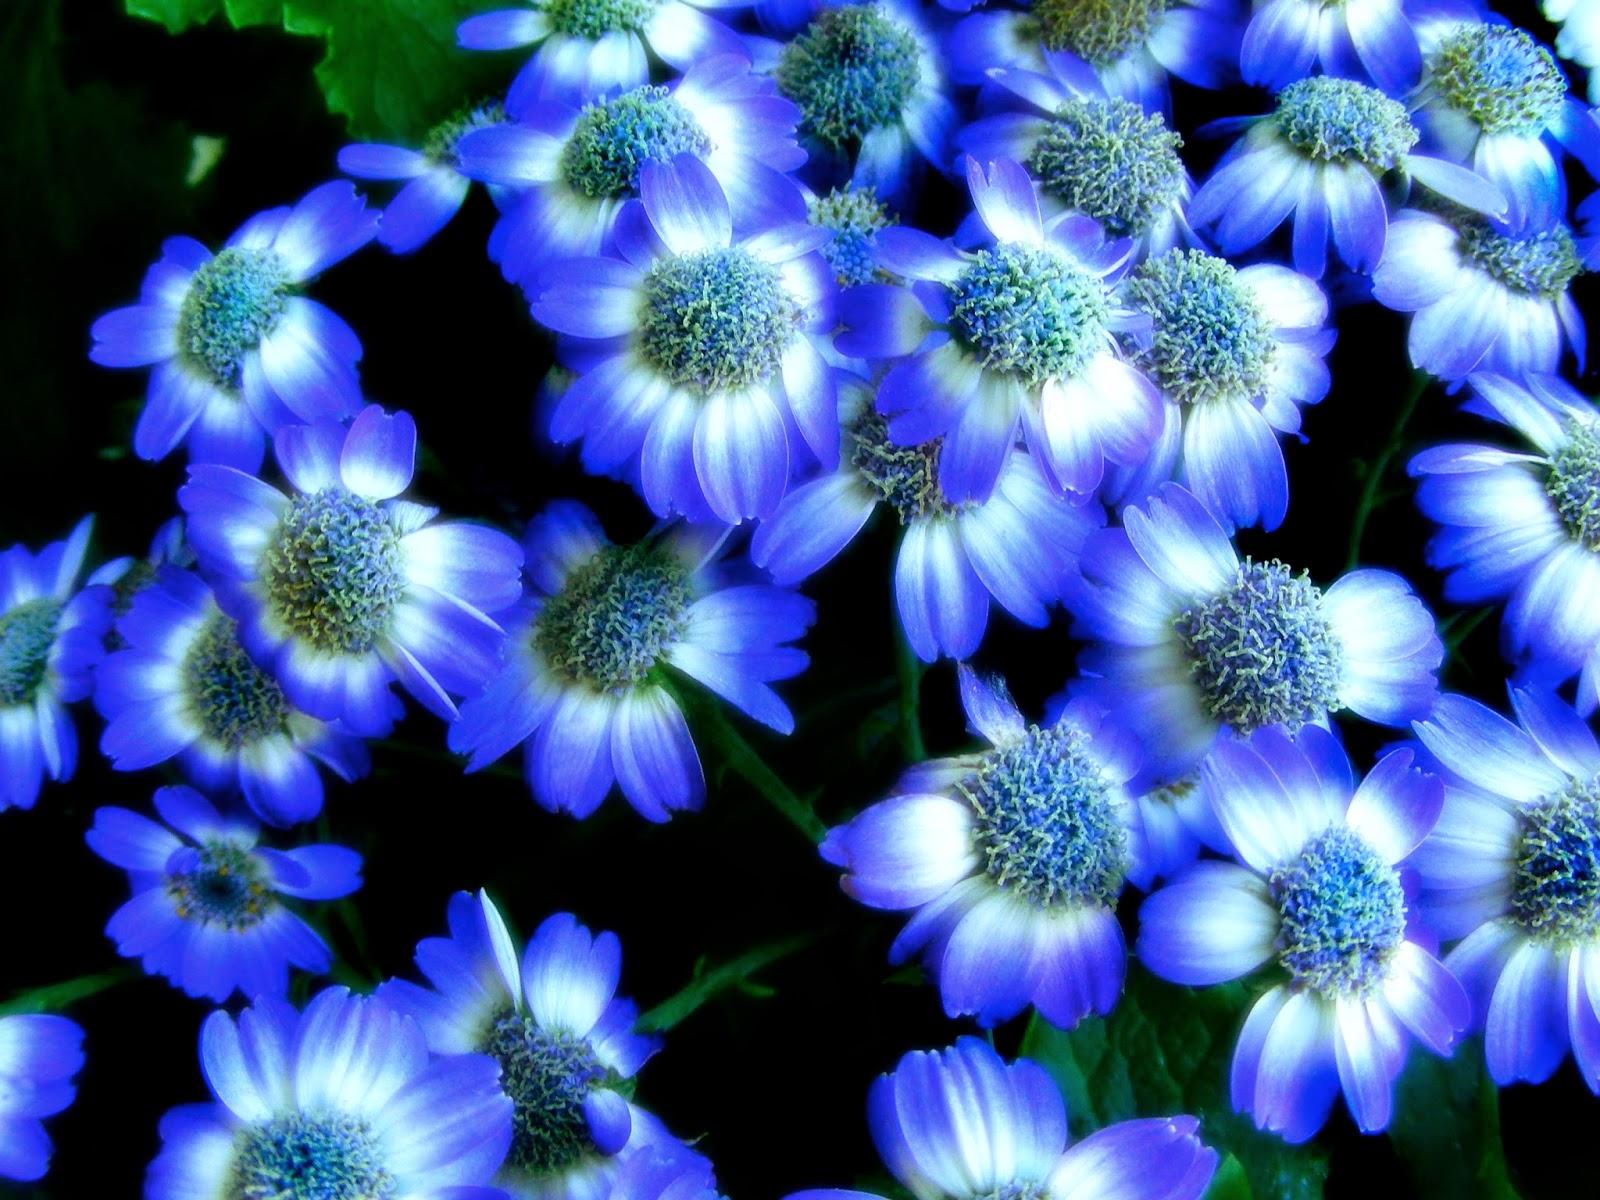 Dark Blue And White Flowers: #2 Great Flowers Wallpaper Desktop Background Full Screen